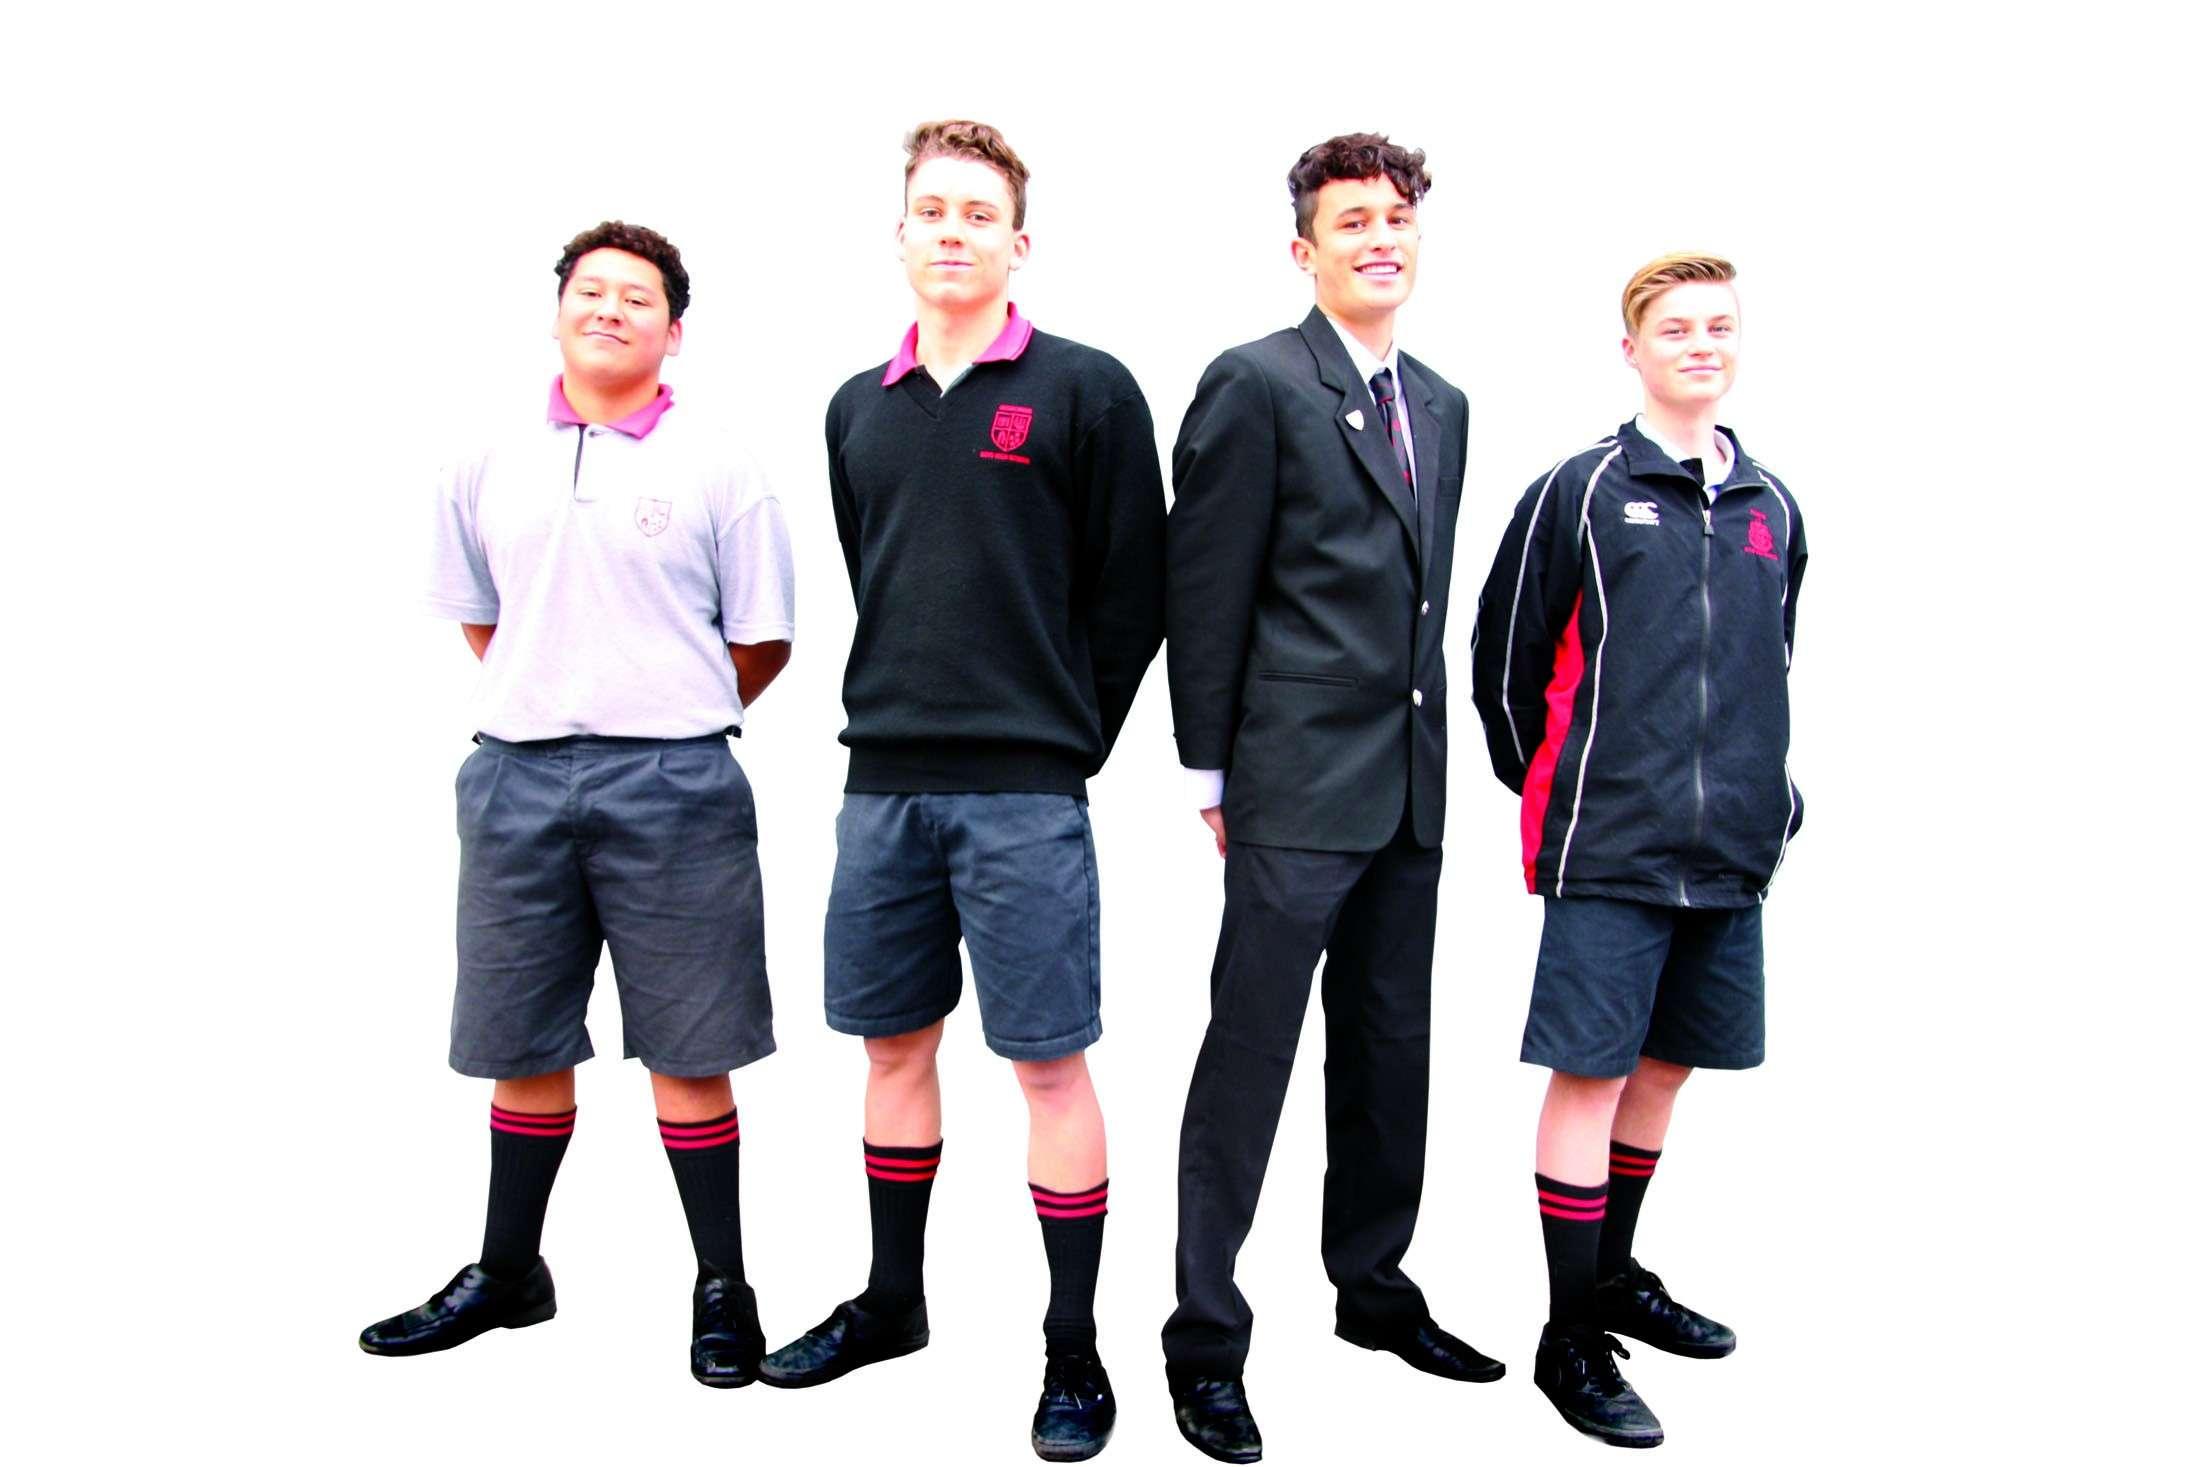 Uniform 2018 Gisborne Boys' High School